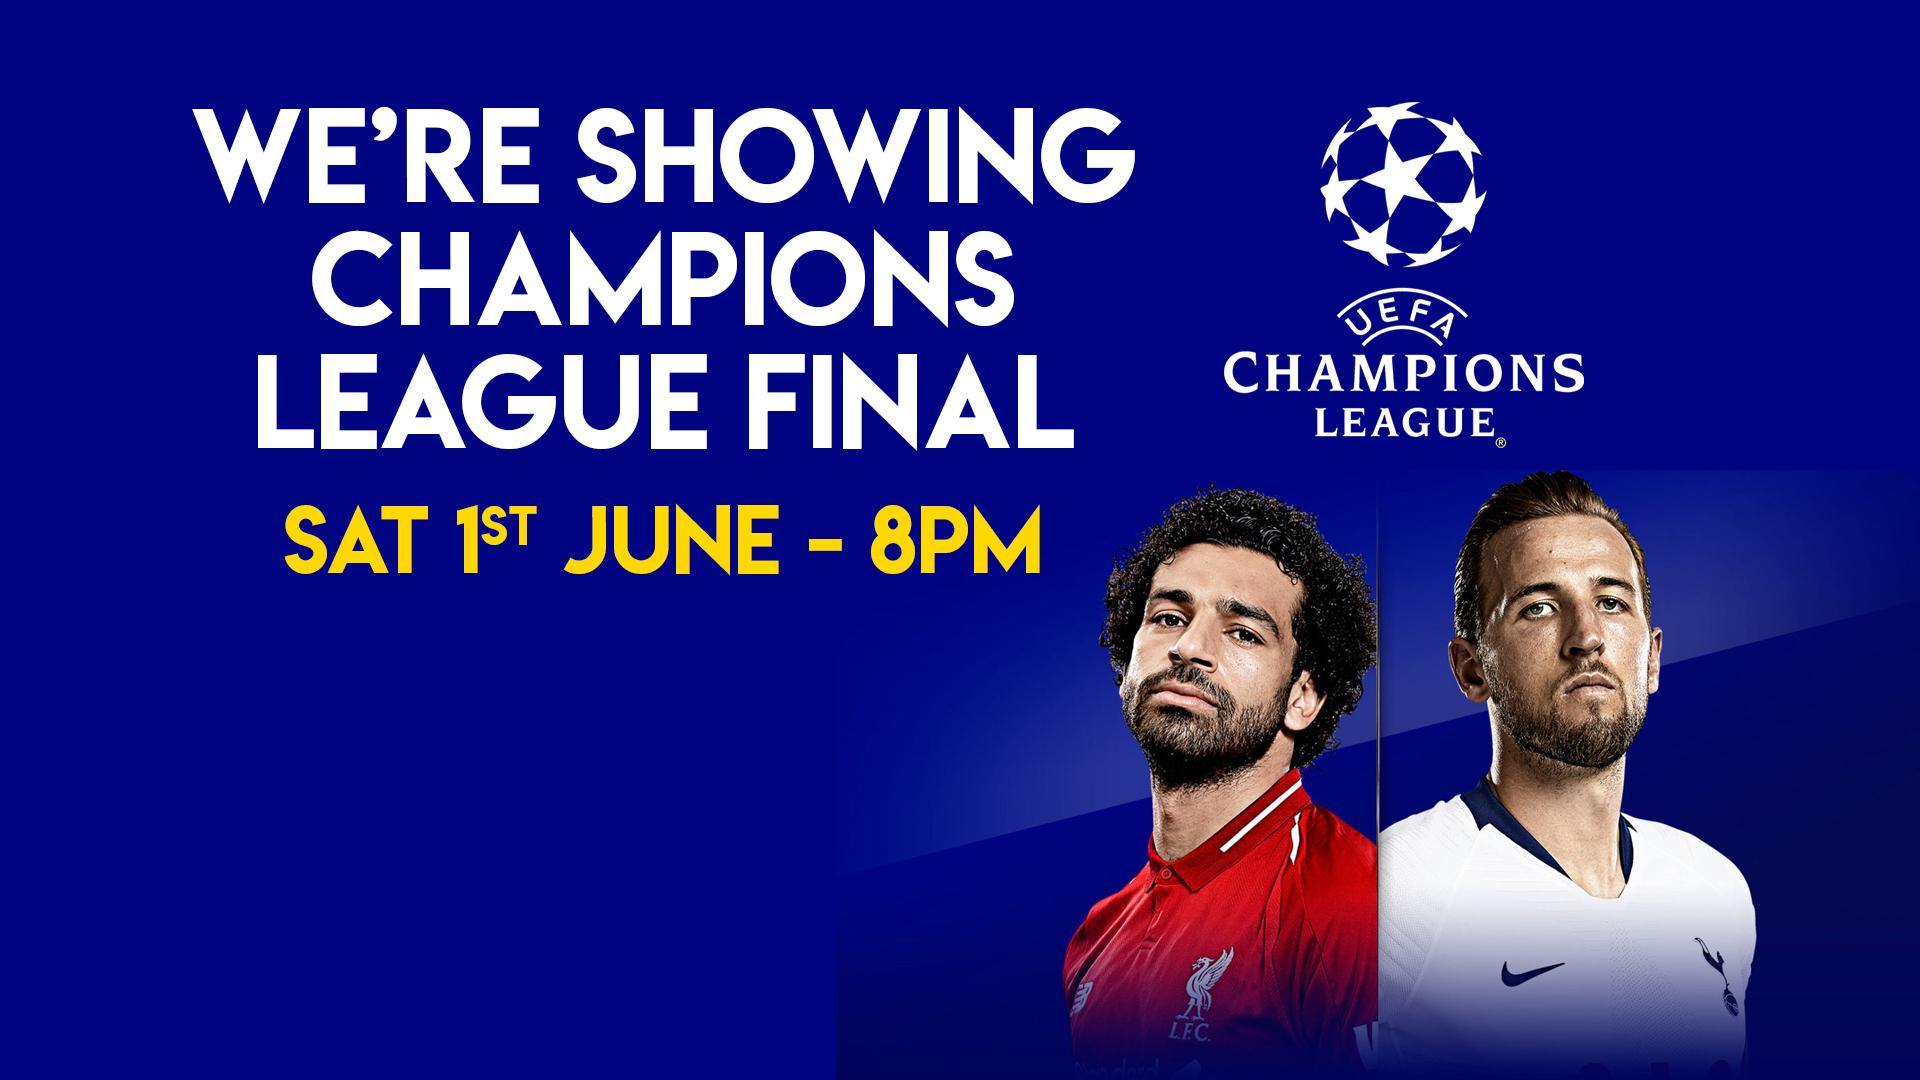 ChampionsLeagueSocials.jpg